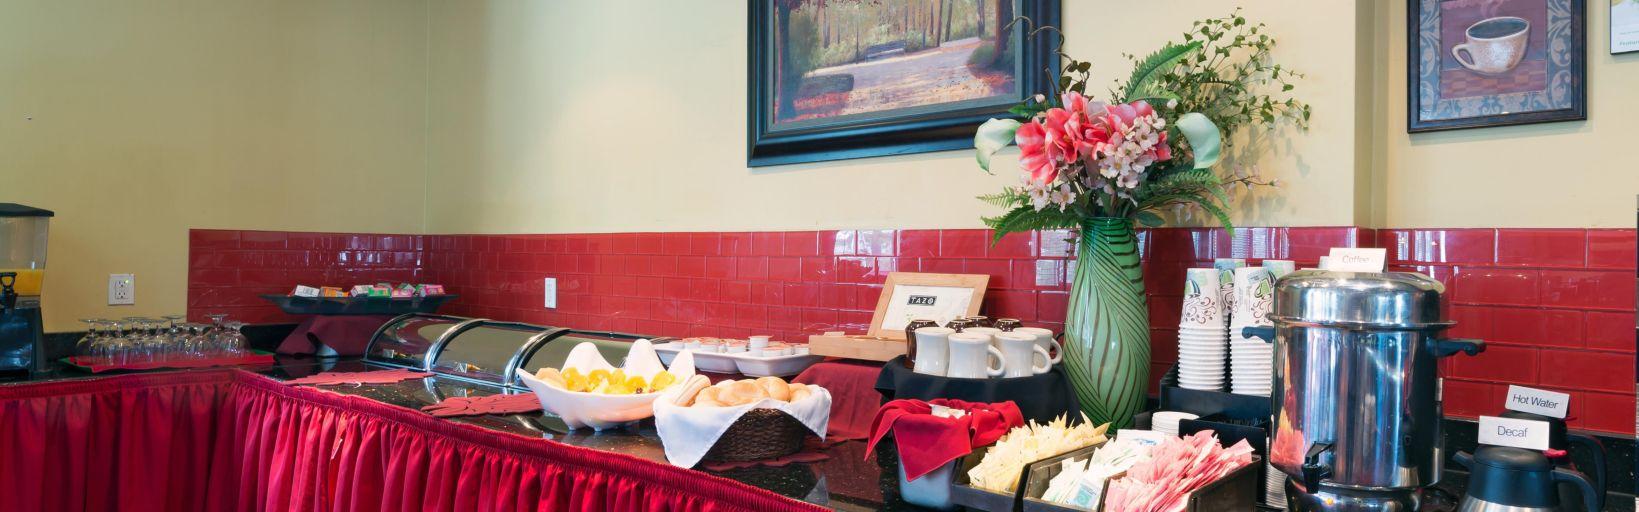 holiday inn totowa ruby lounge